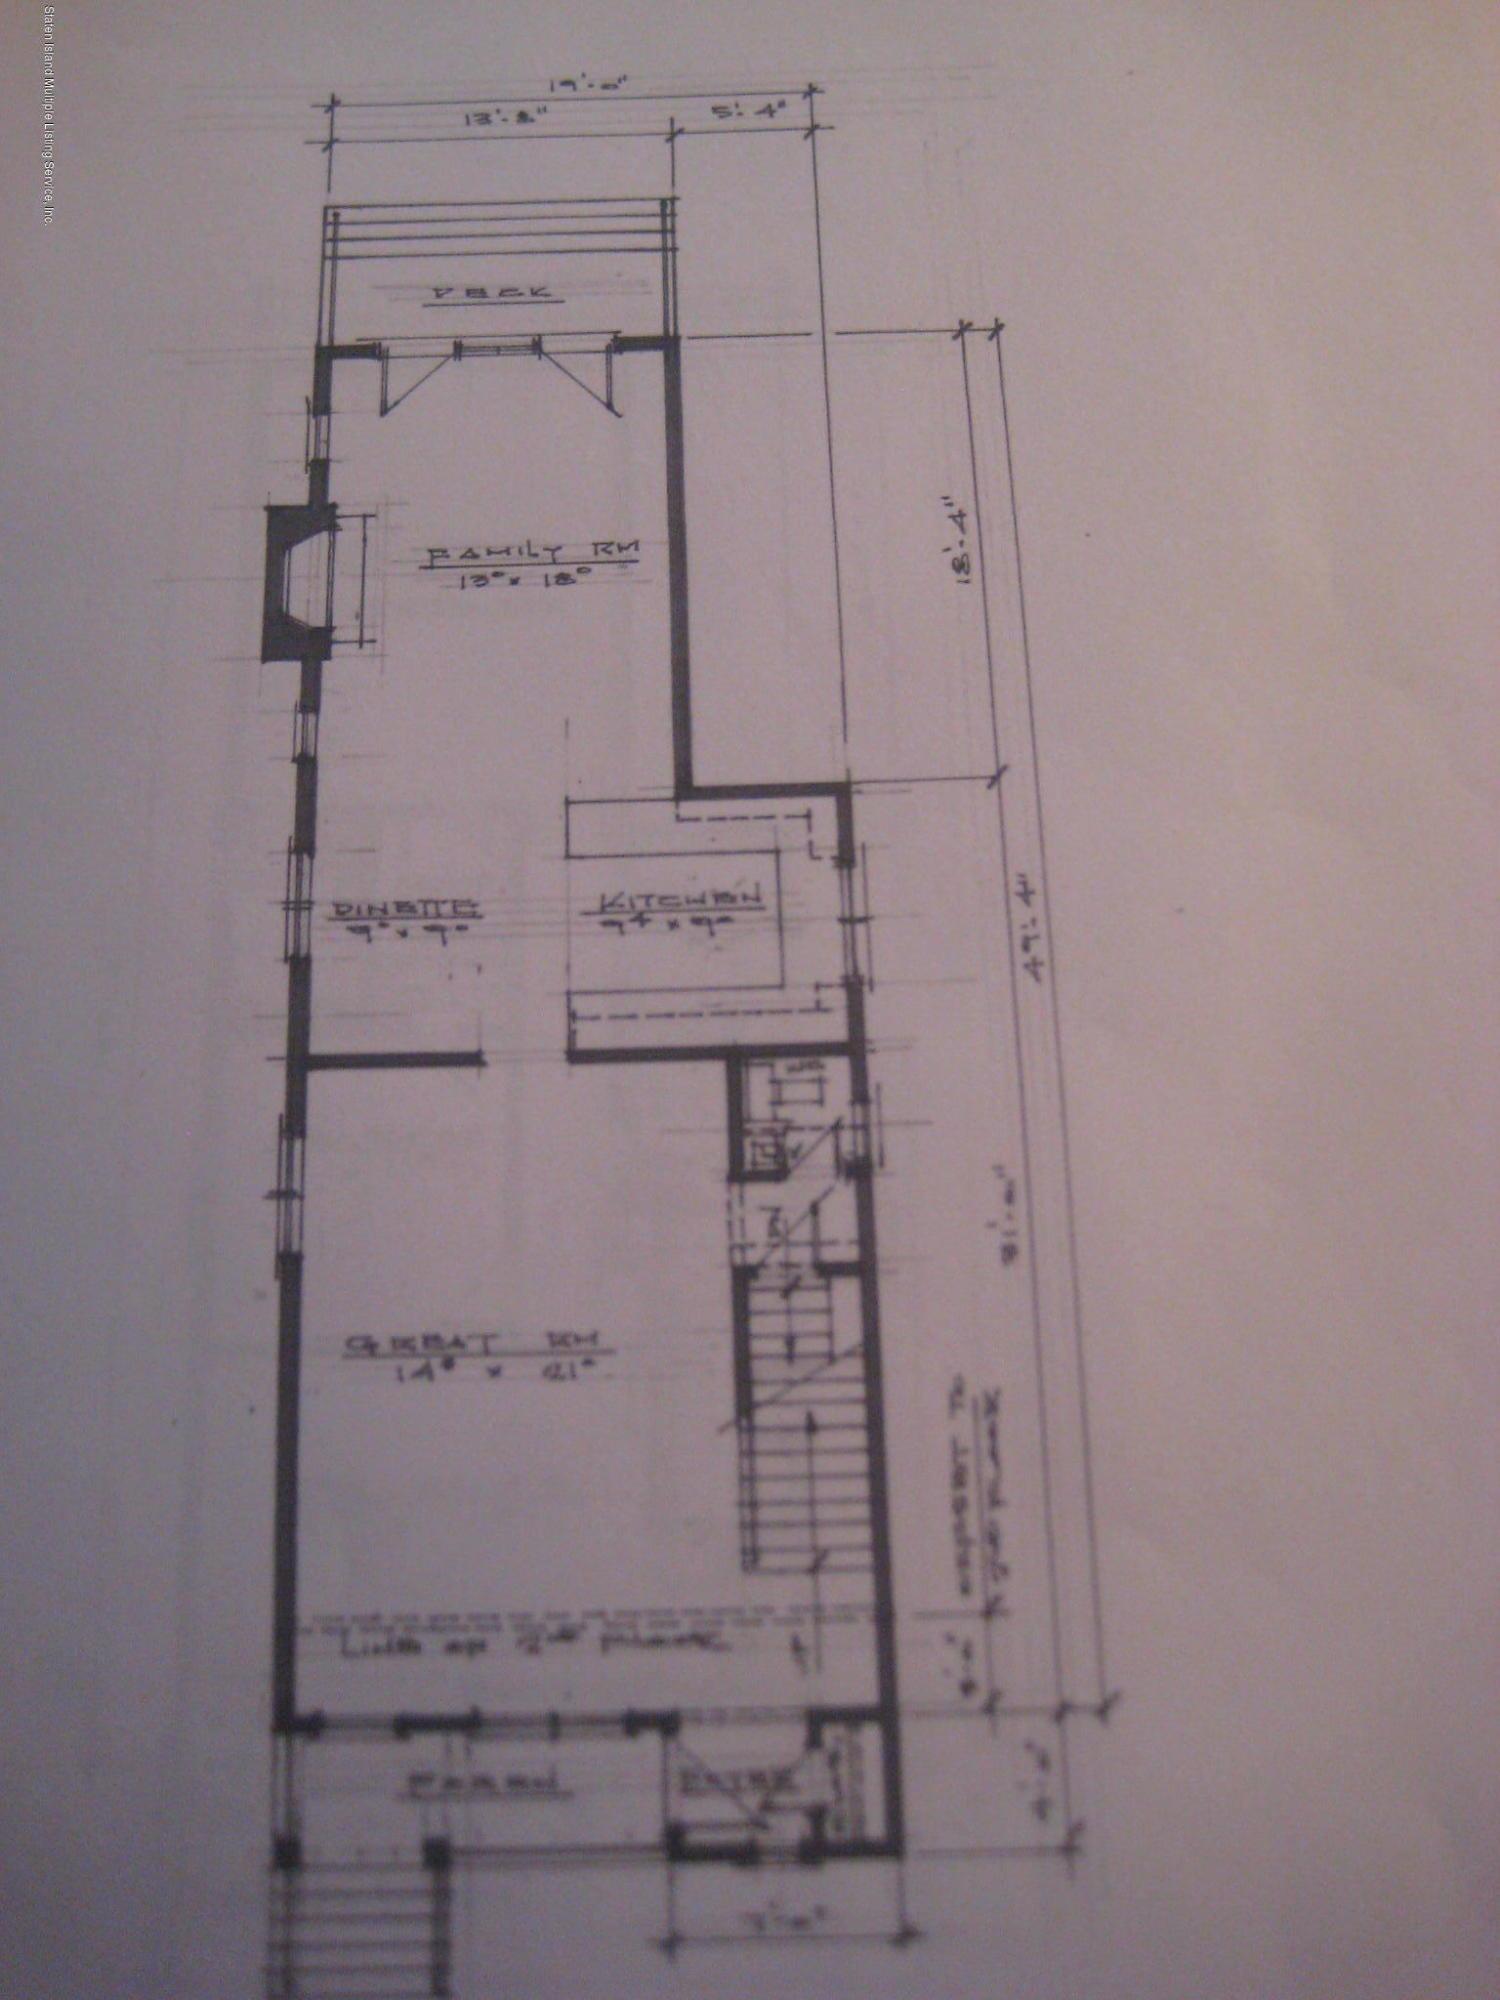 Single Family - Detached 28 Scribner Avenue  Staten Island, NY 10301, MLS-1130251-6